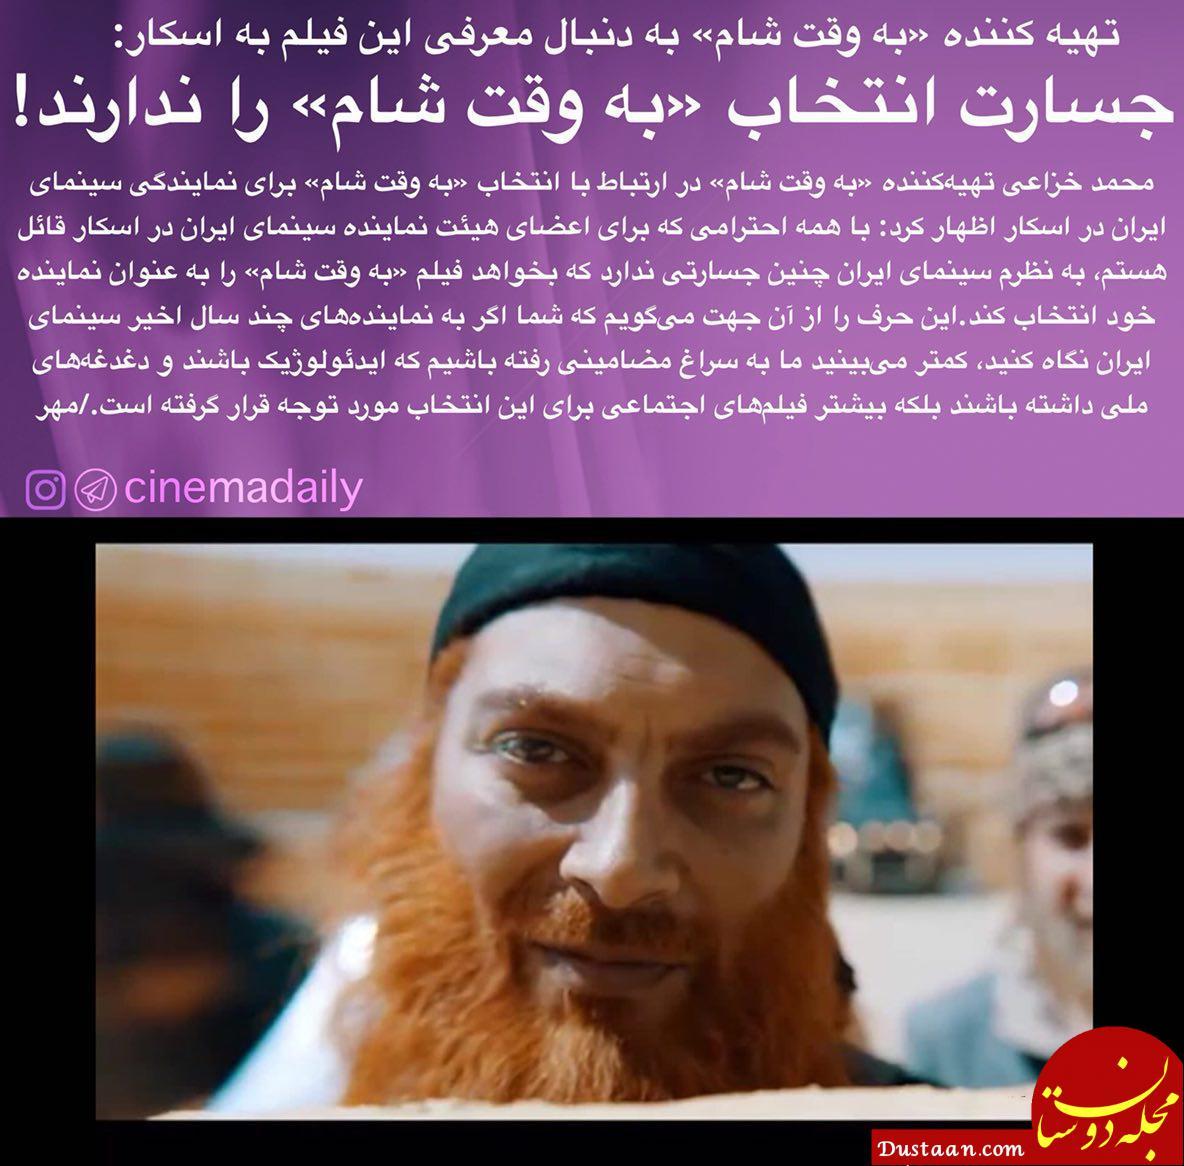 www.dustaan.com جسارت معرفی «به وقت شام» به اسکار را ندارند! +عکس